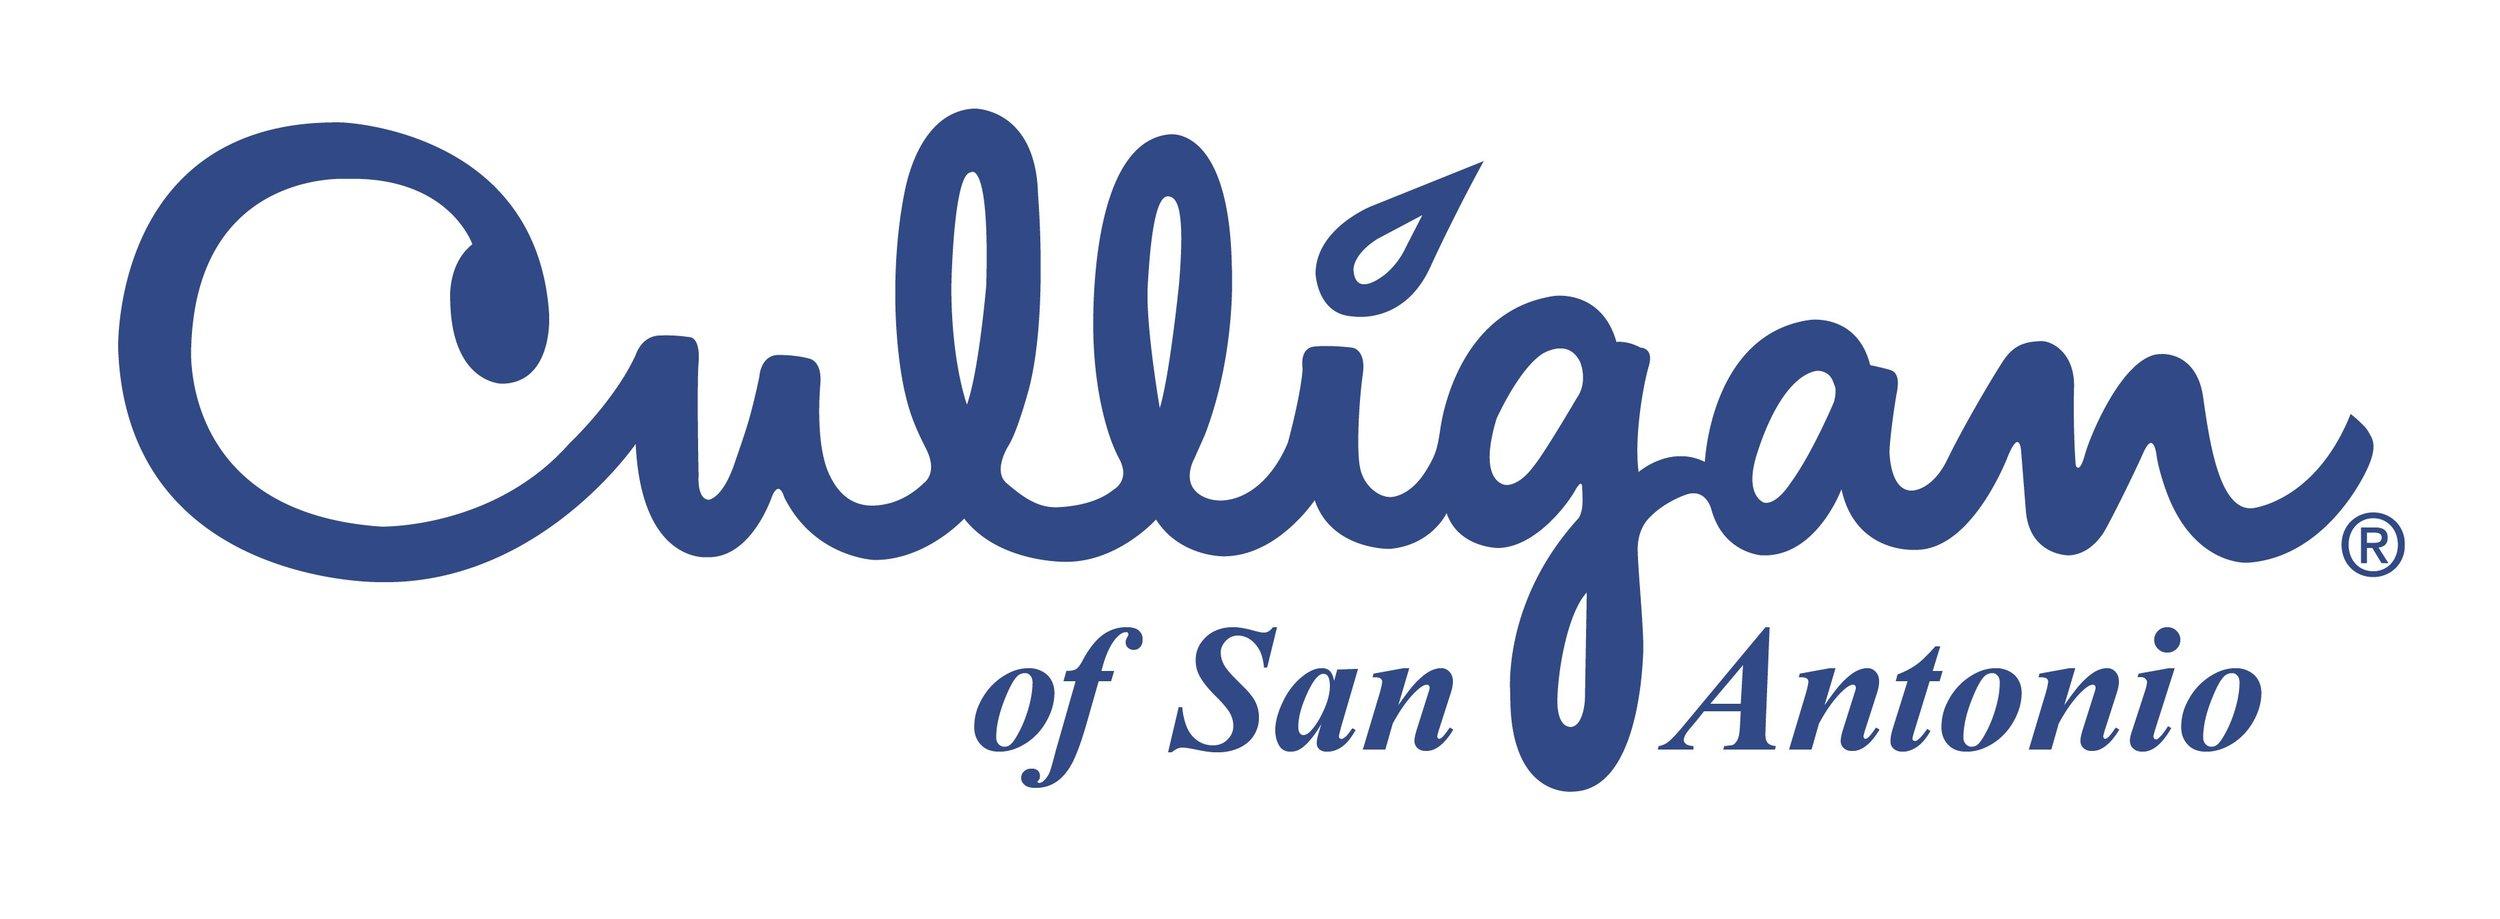 Culligan of San Antonio.jpg